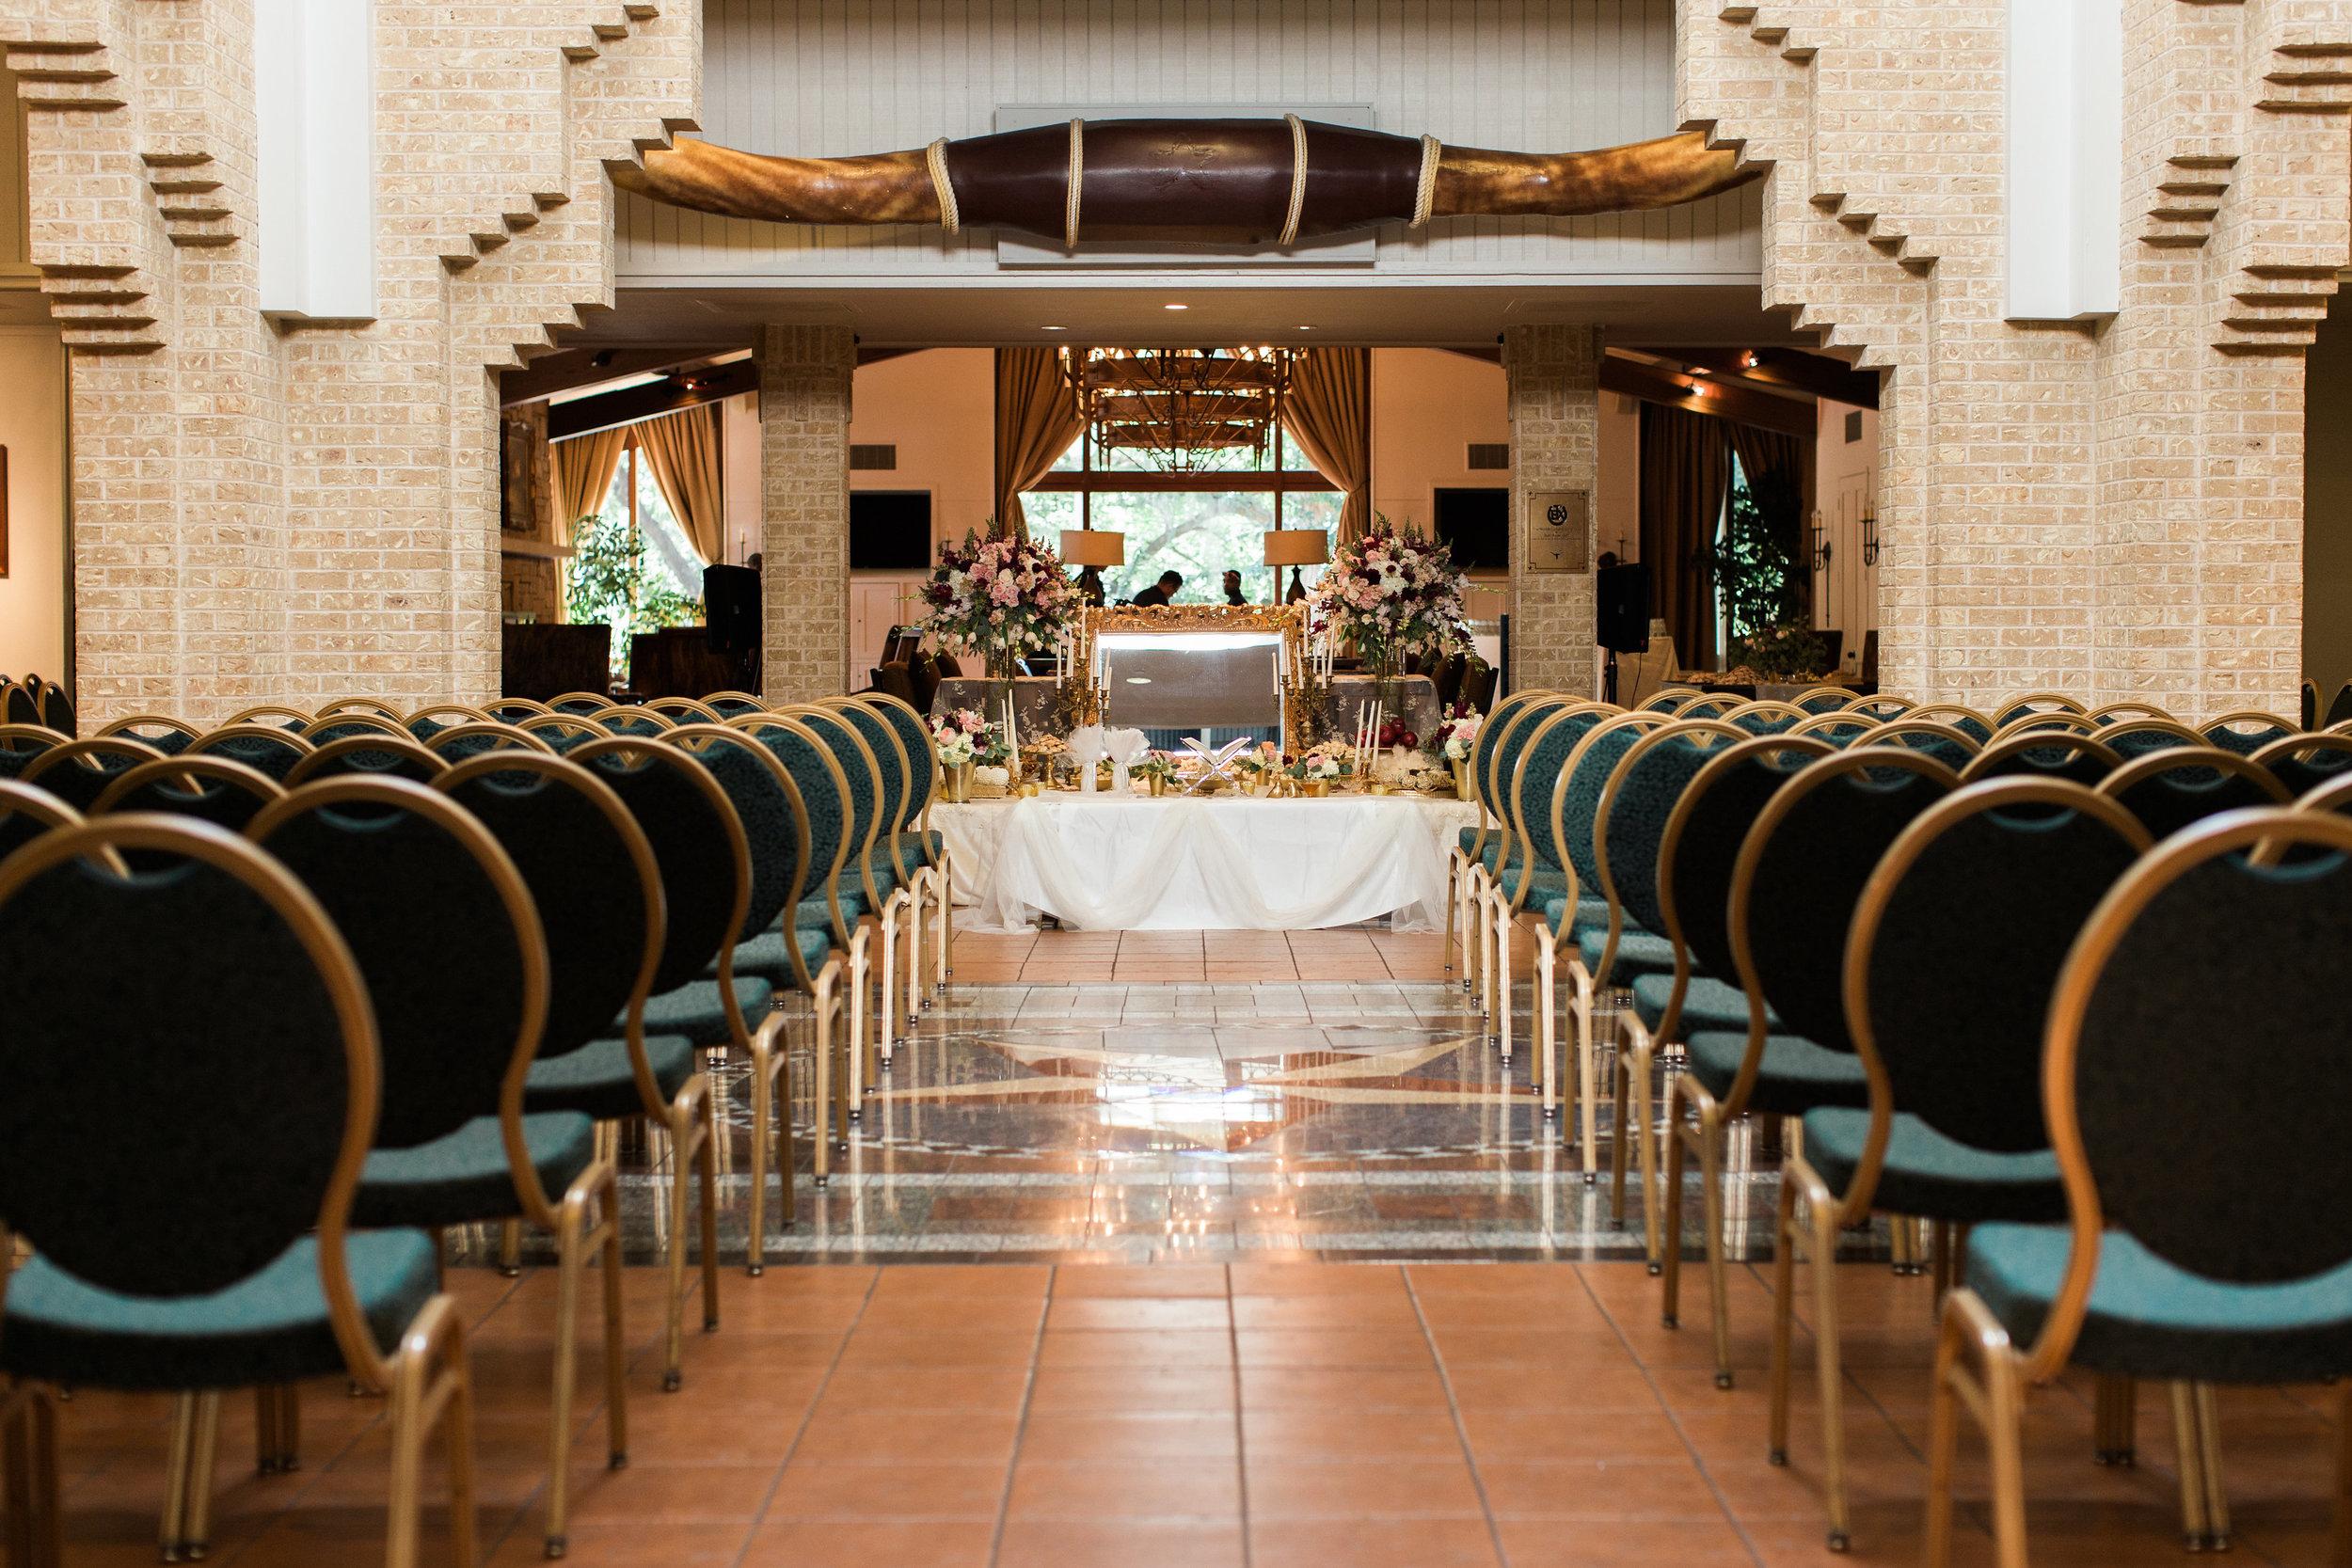 indoor ceremony rain plan for Jewish wedding